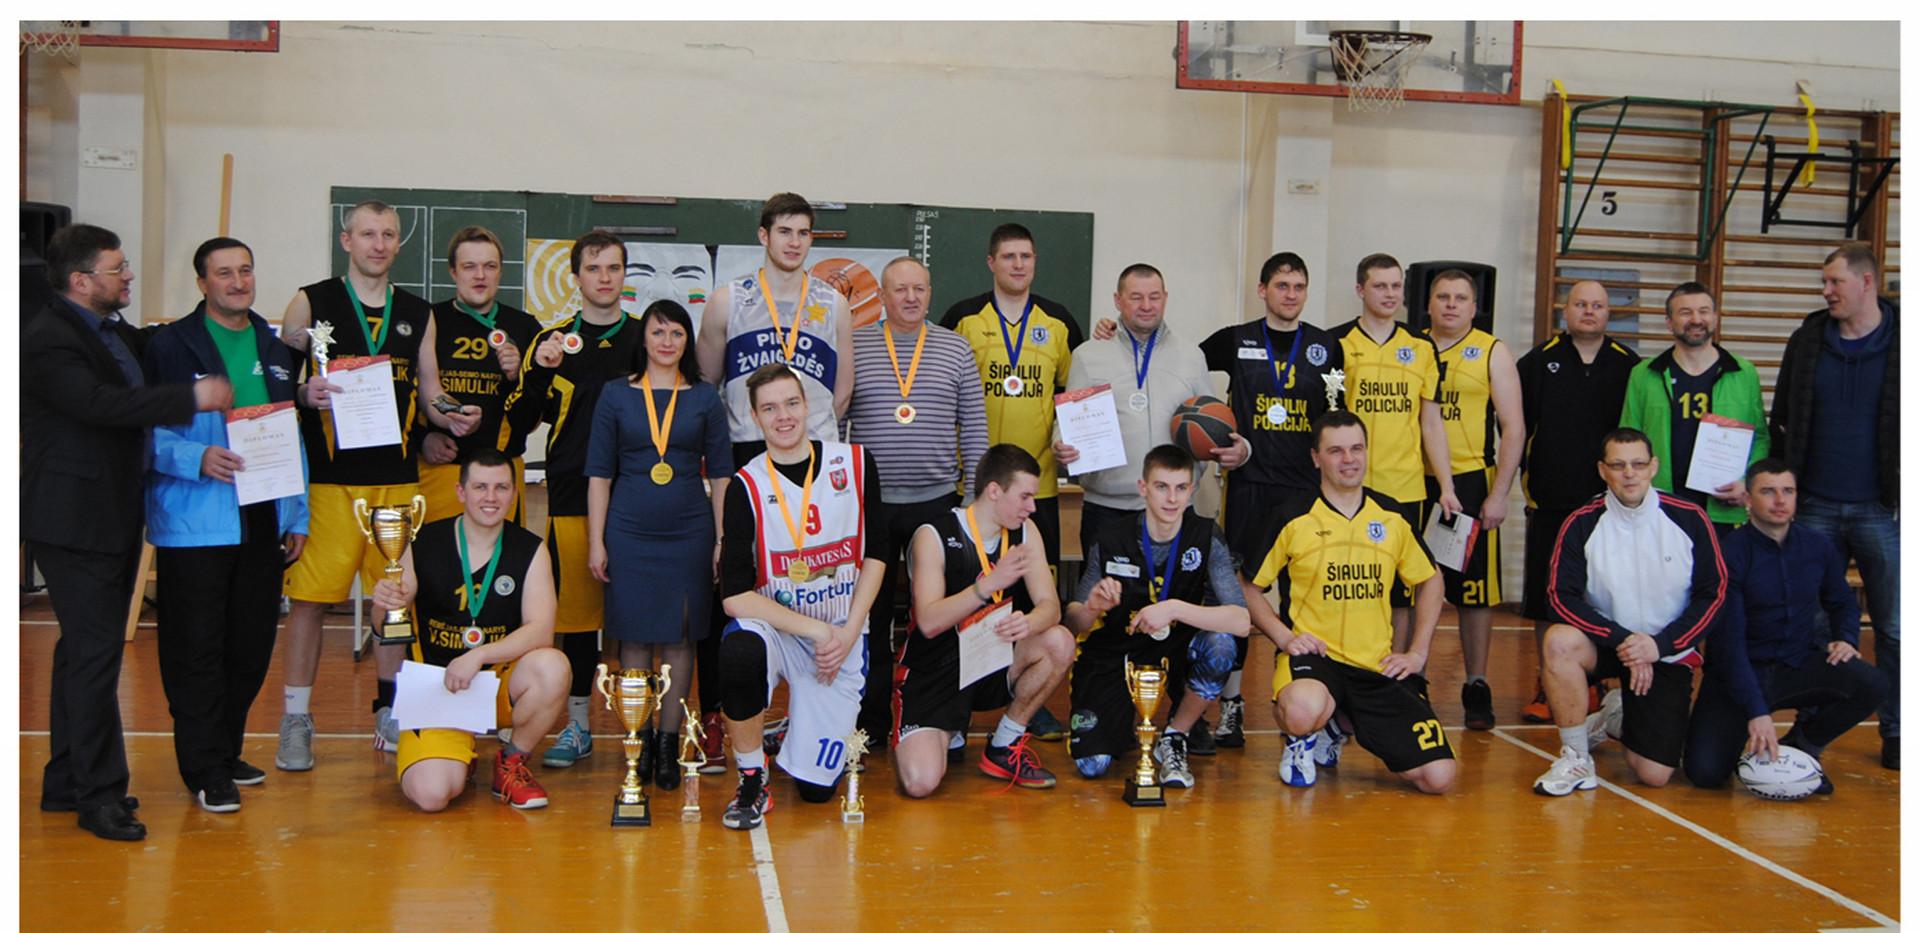 Winners of the basketball match